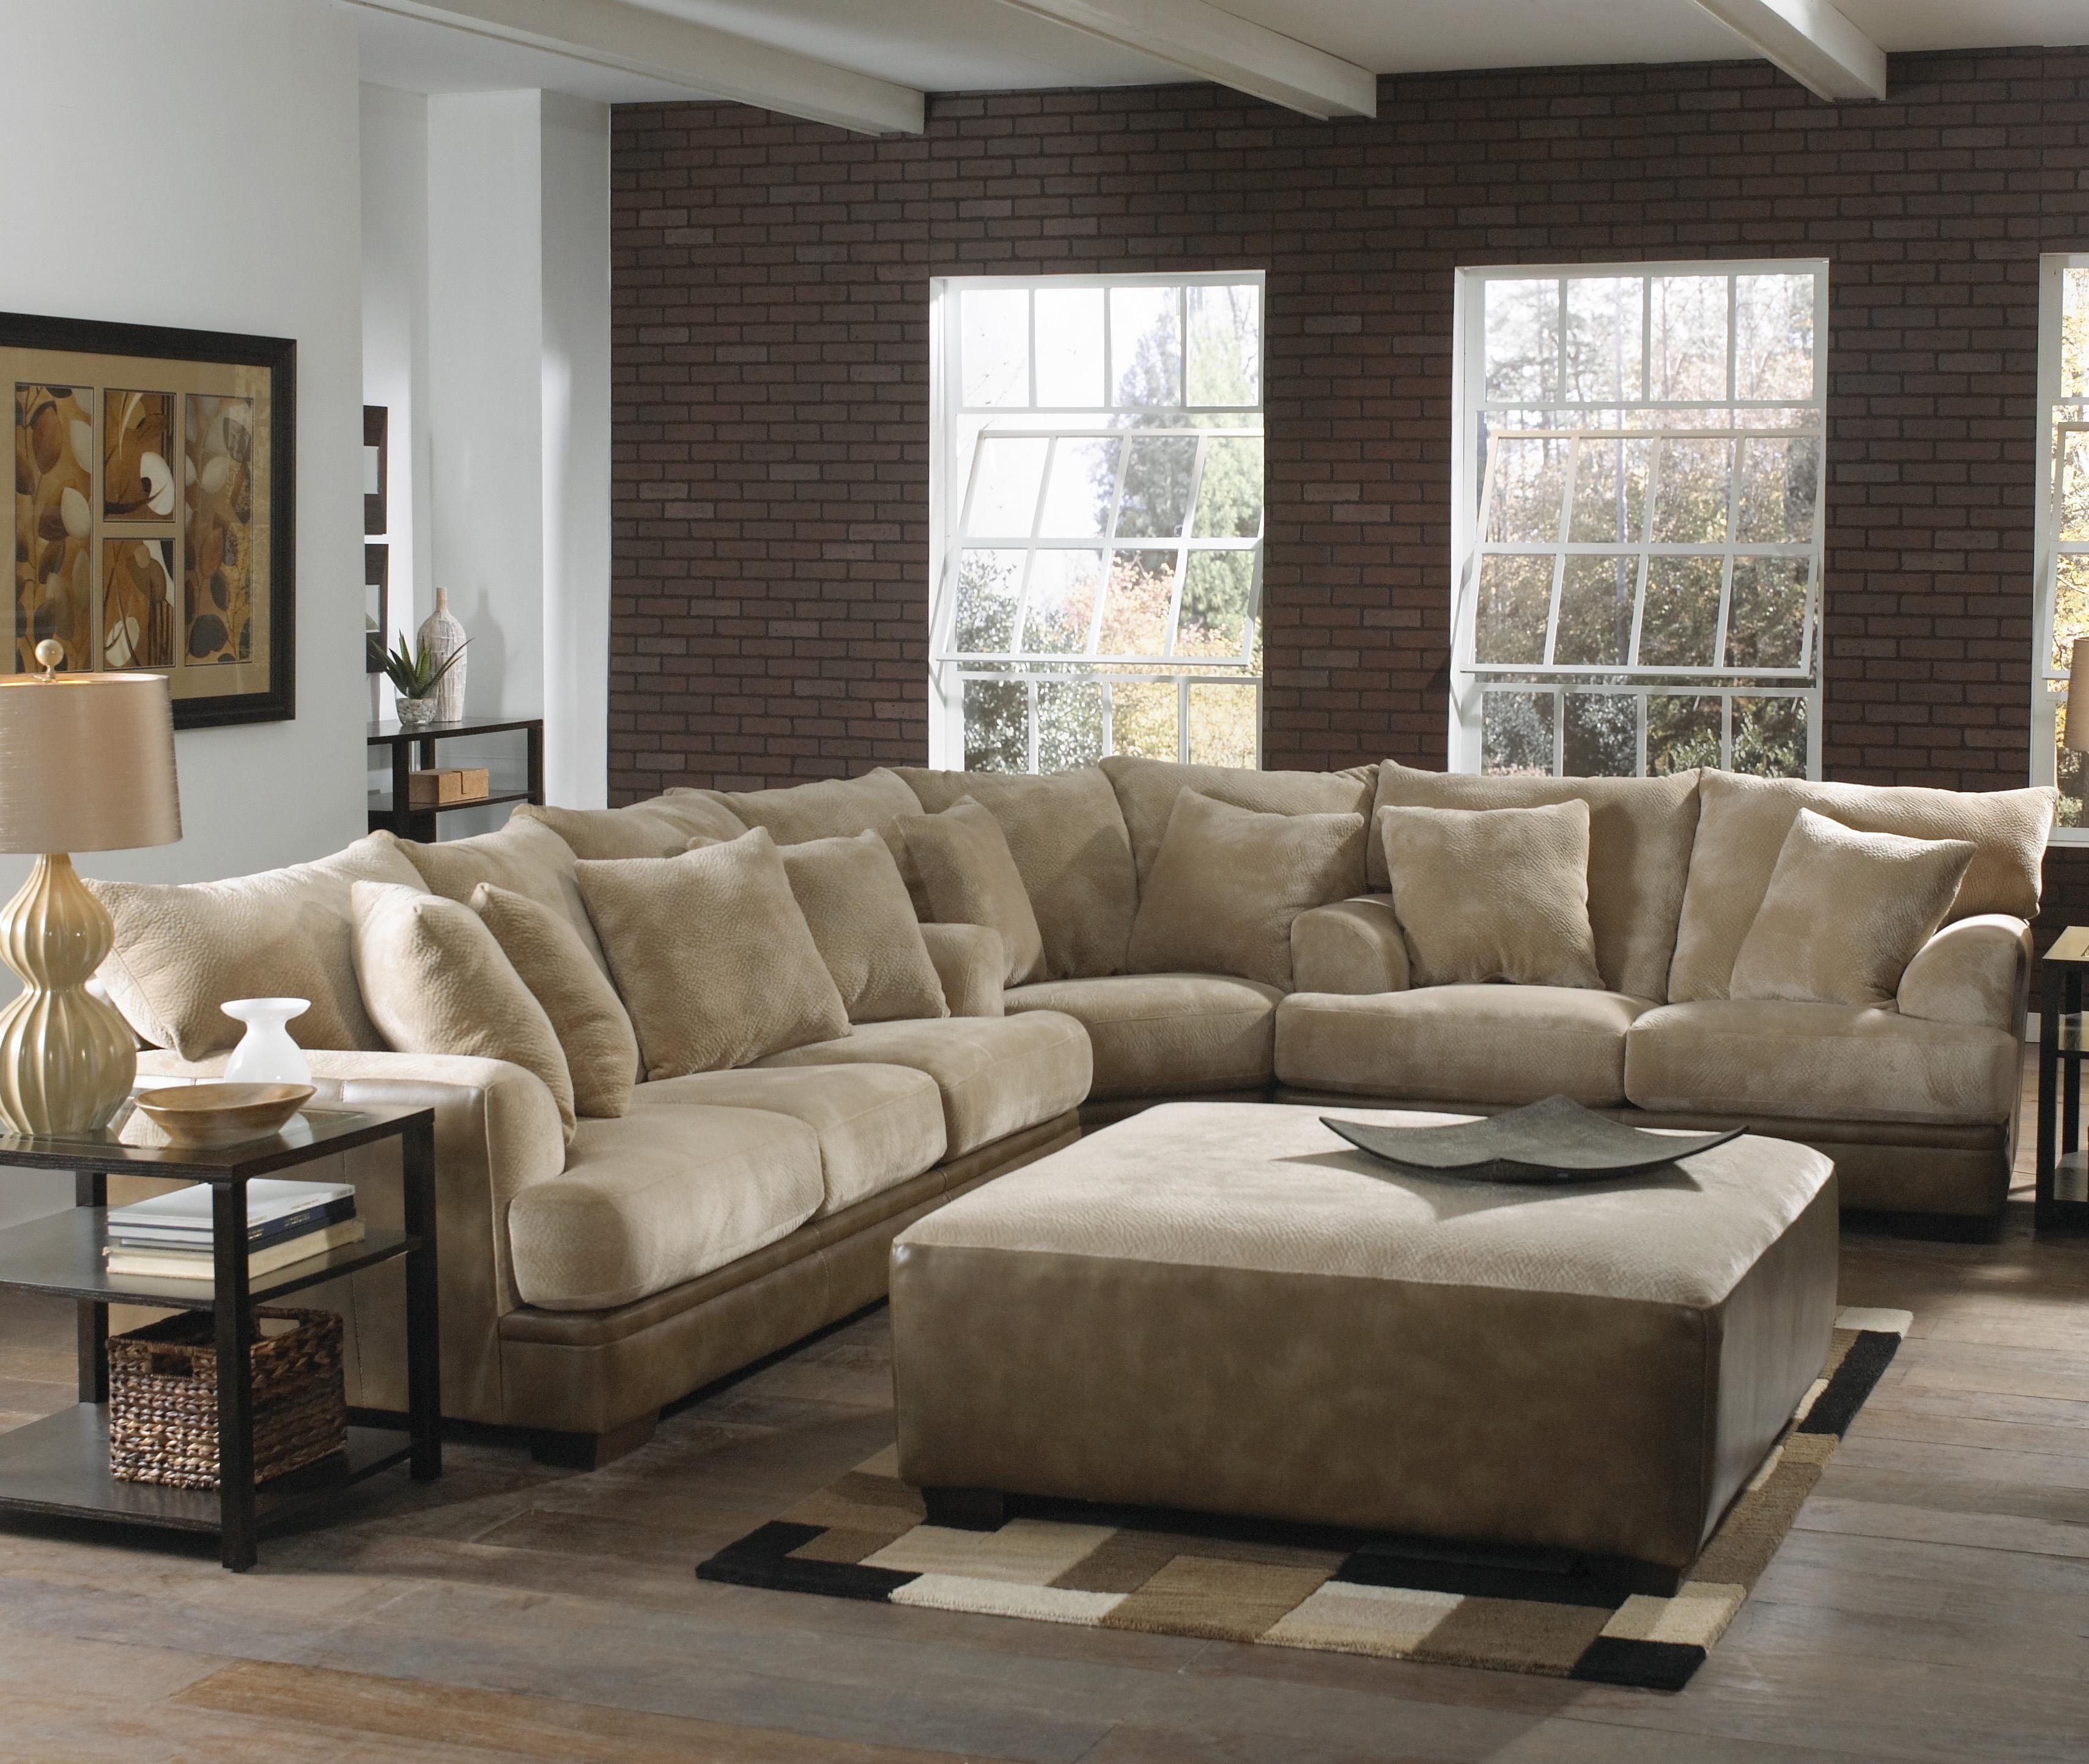 Super Plush Sectional Sofa